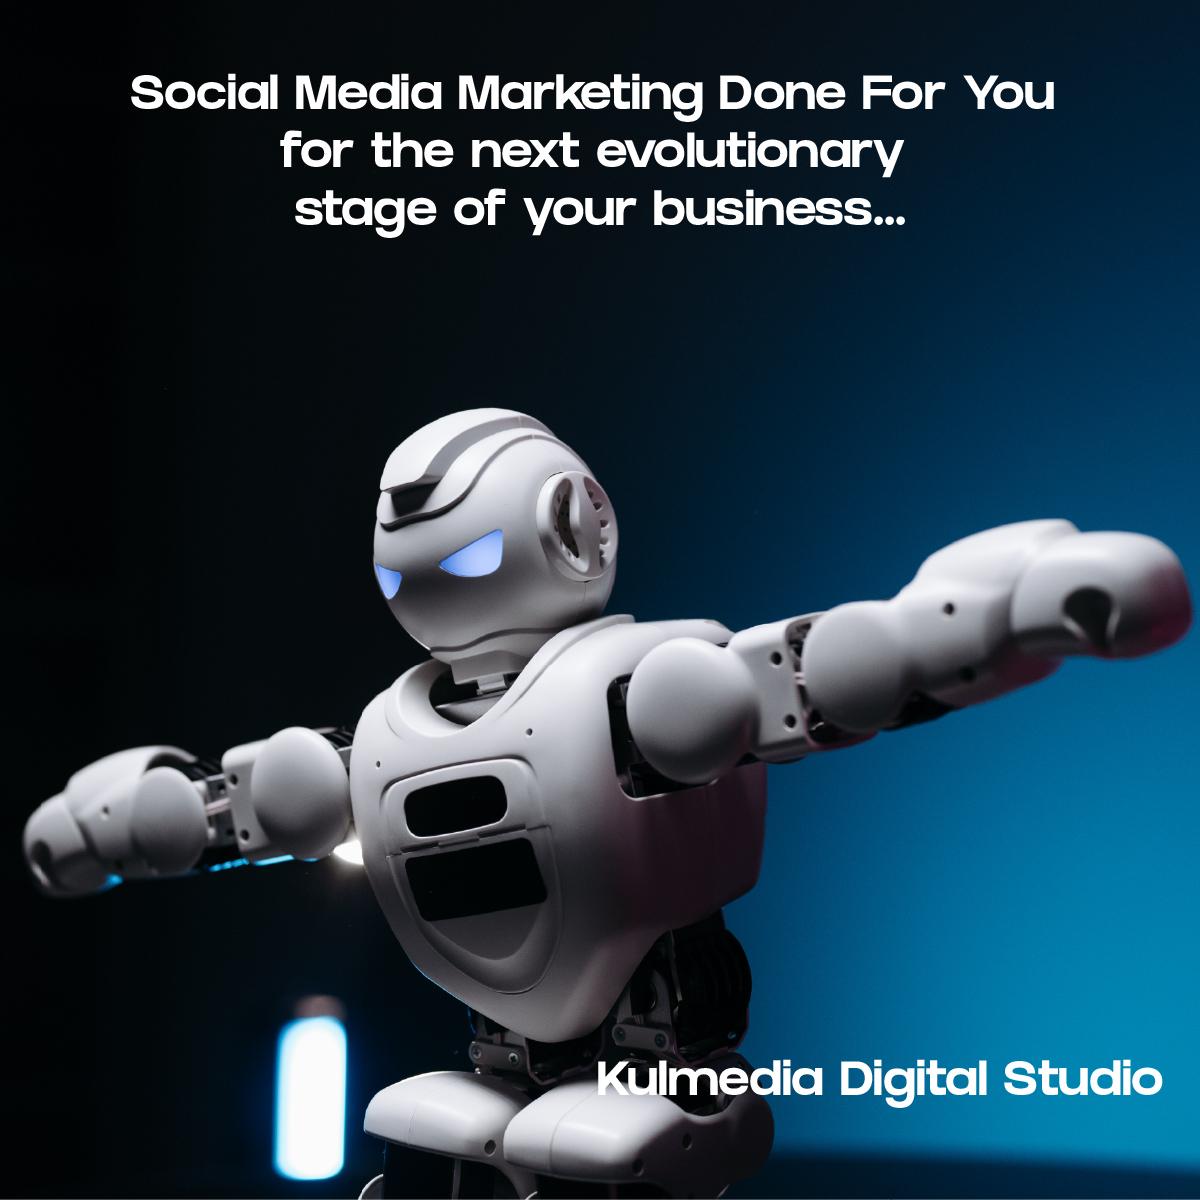 Social Media Marketing by Kulmedia Digital Studio